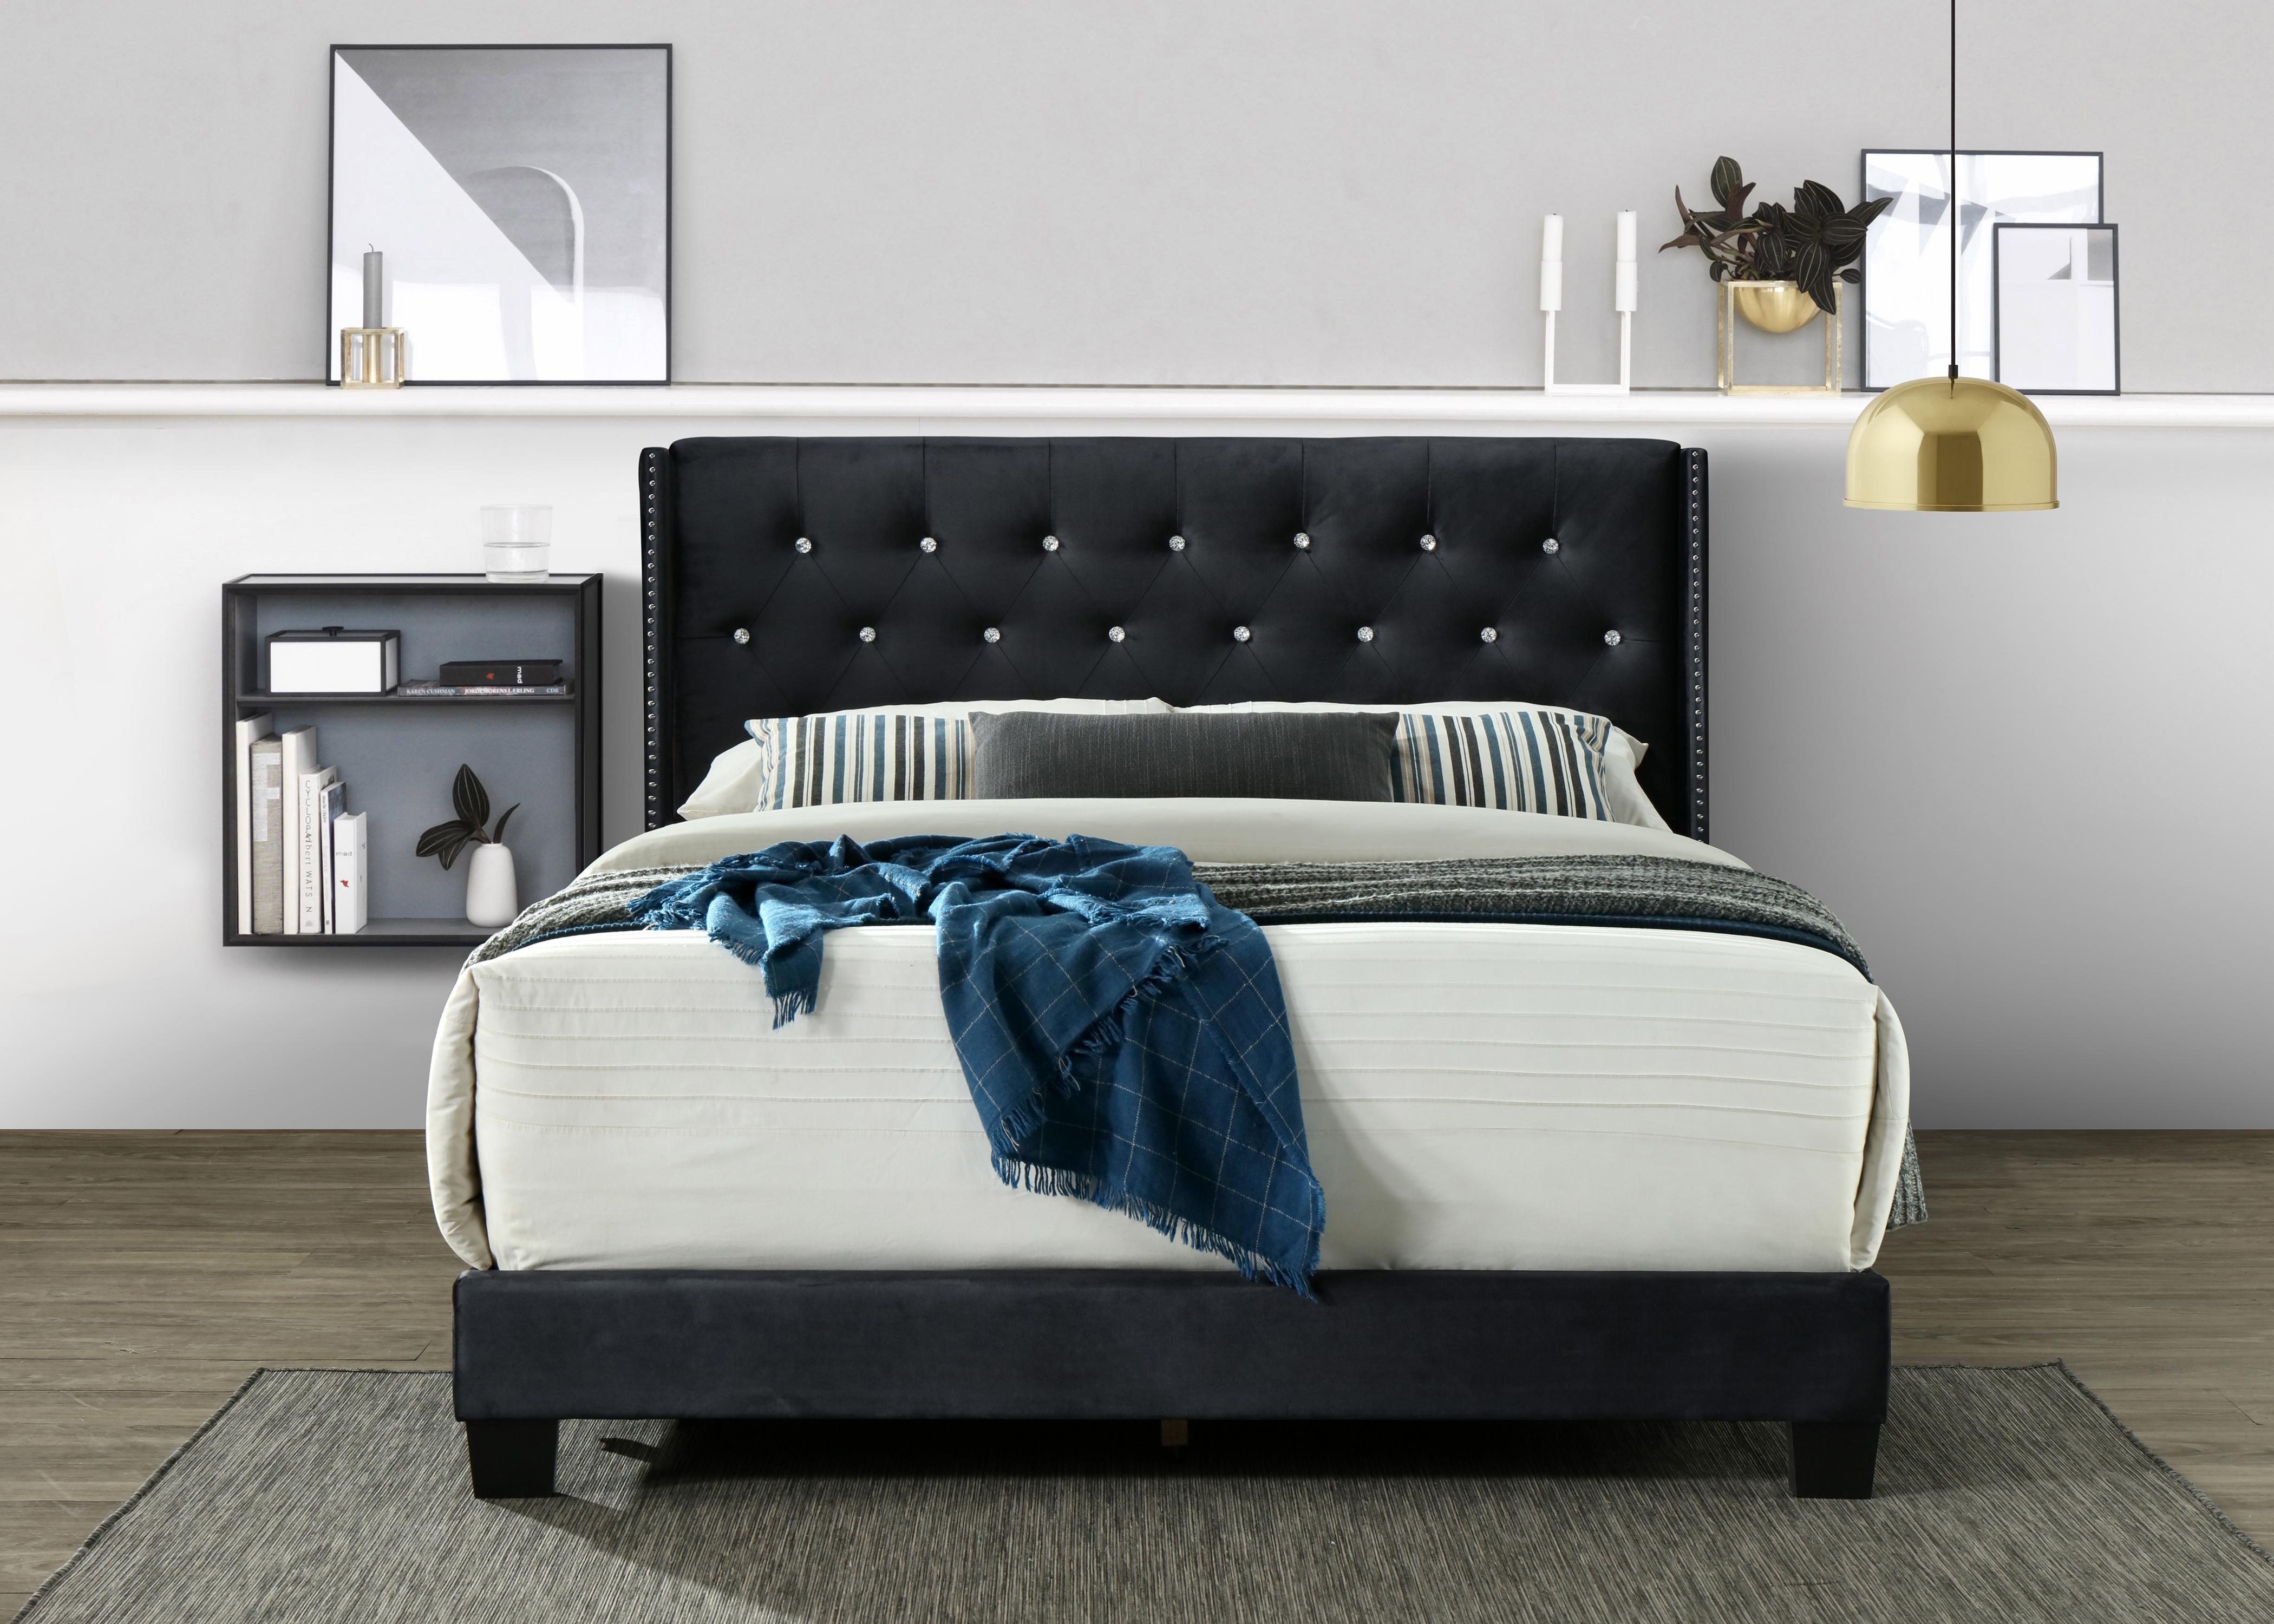 Diamond Bed